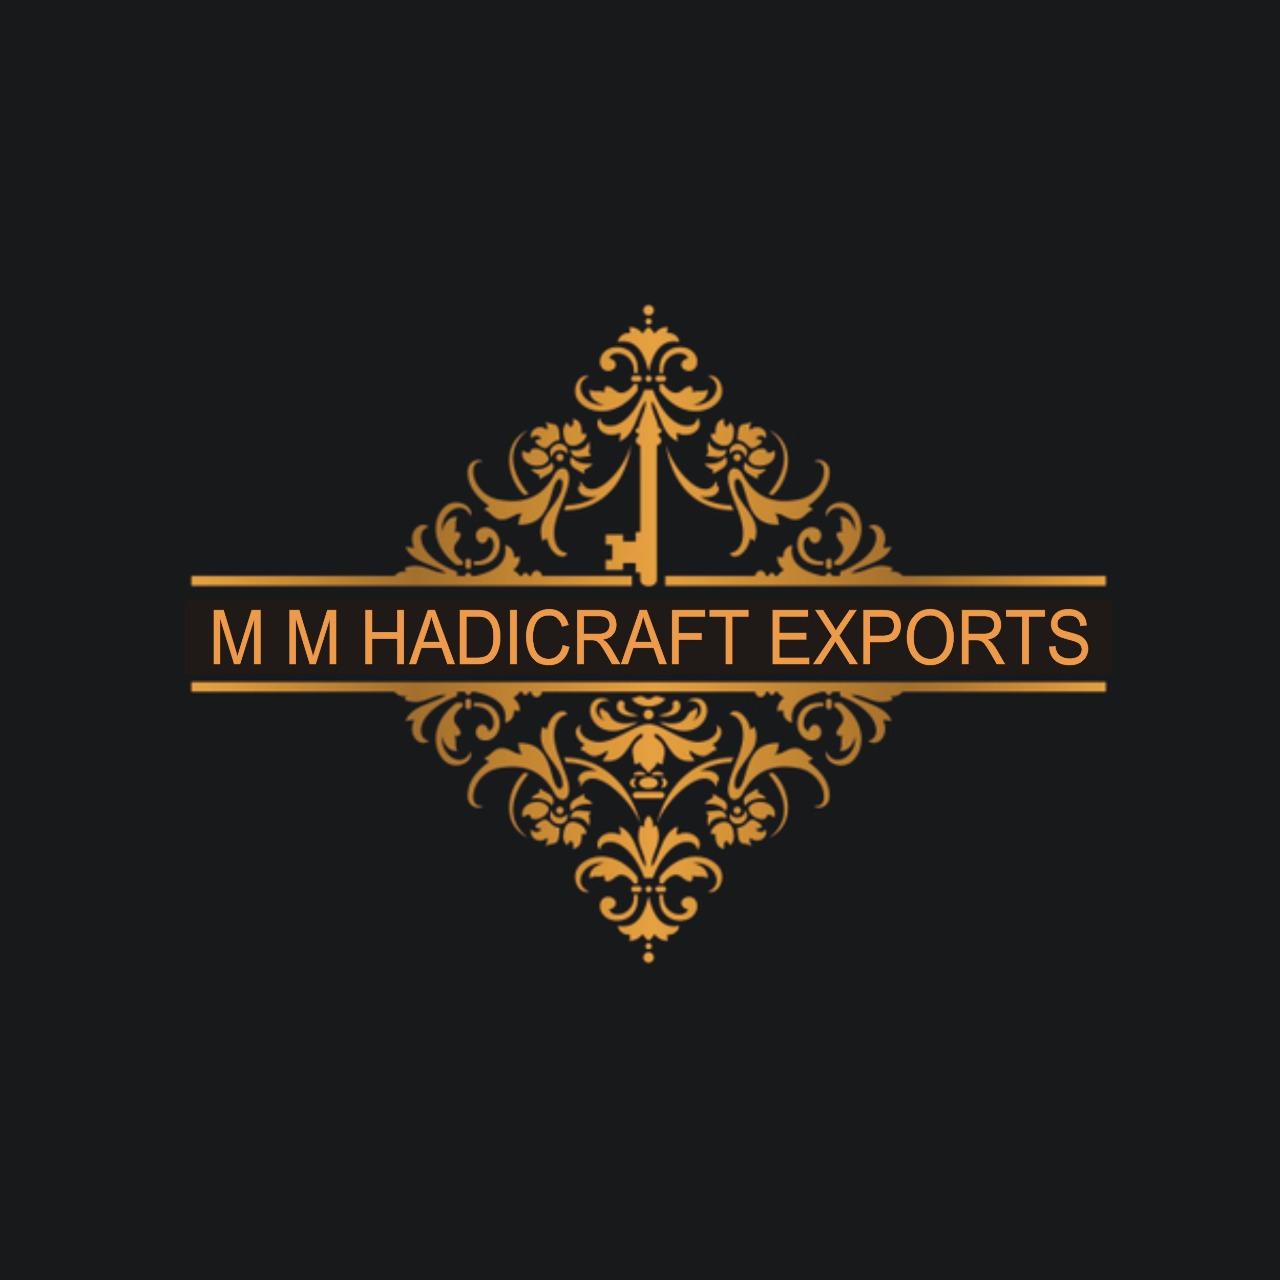 M.M. HANDICRAFT EXPORTS